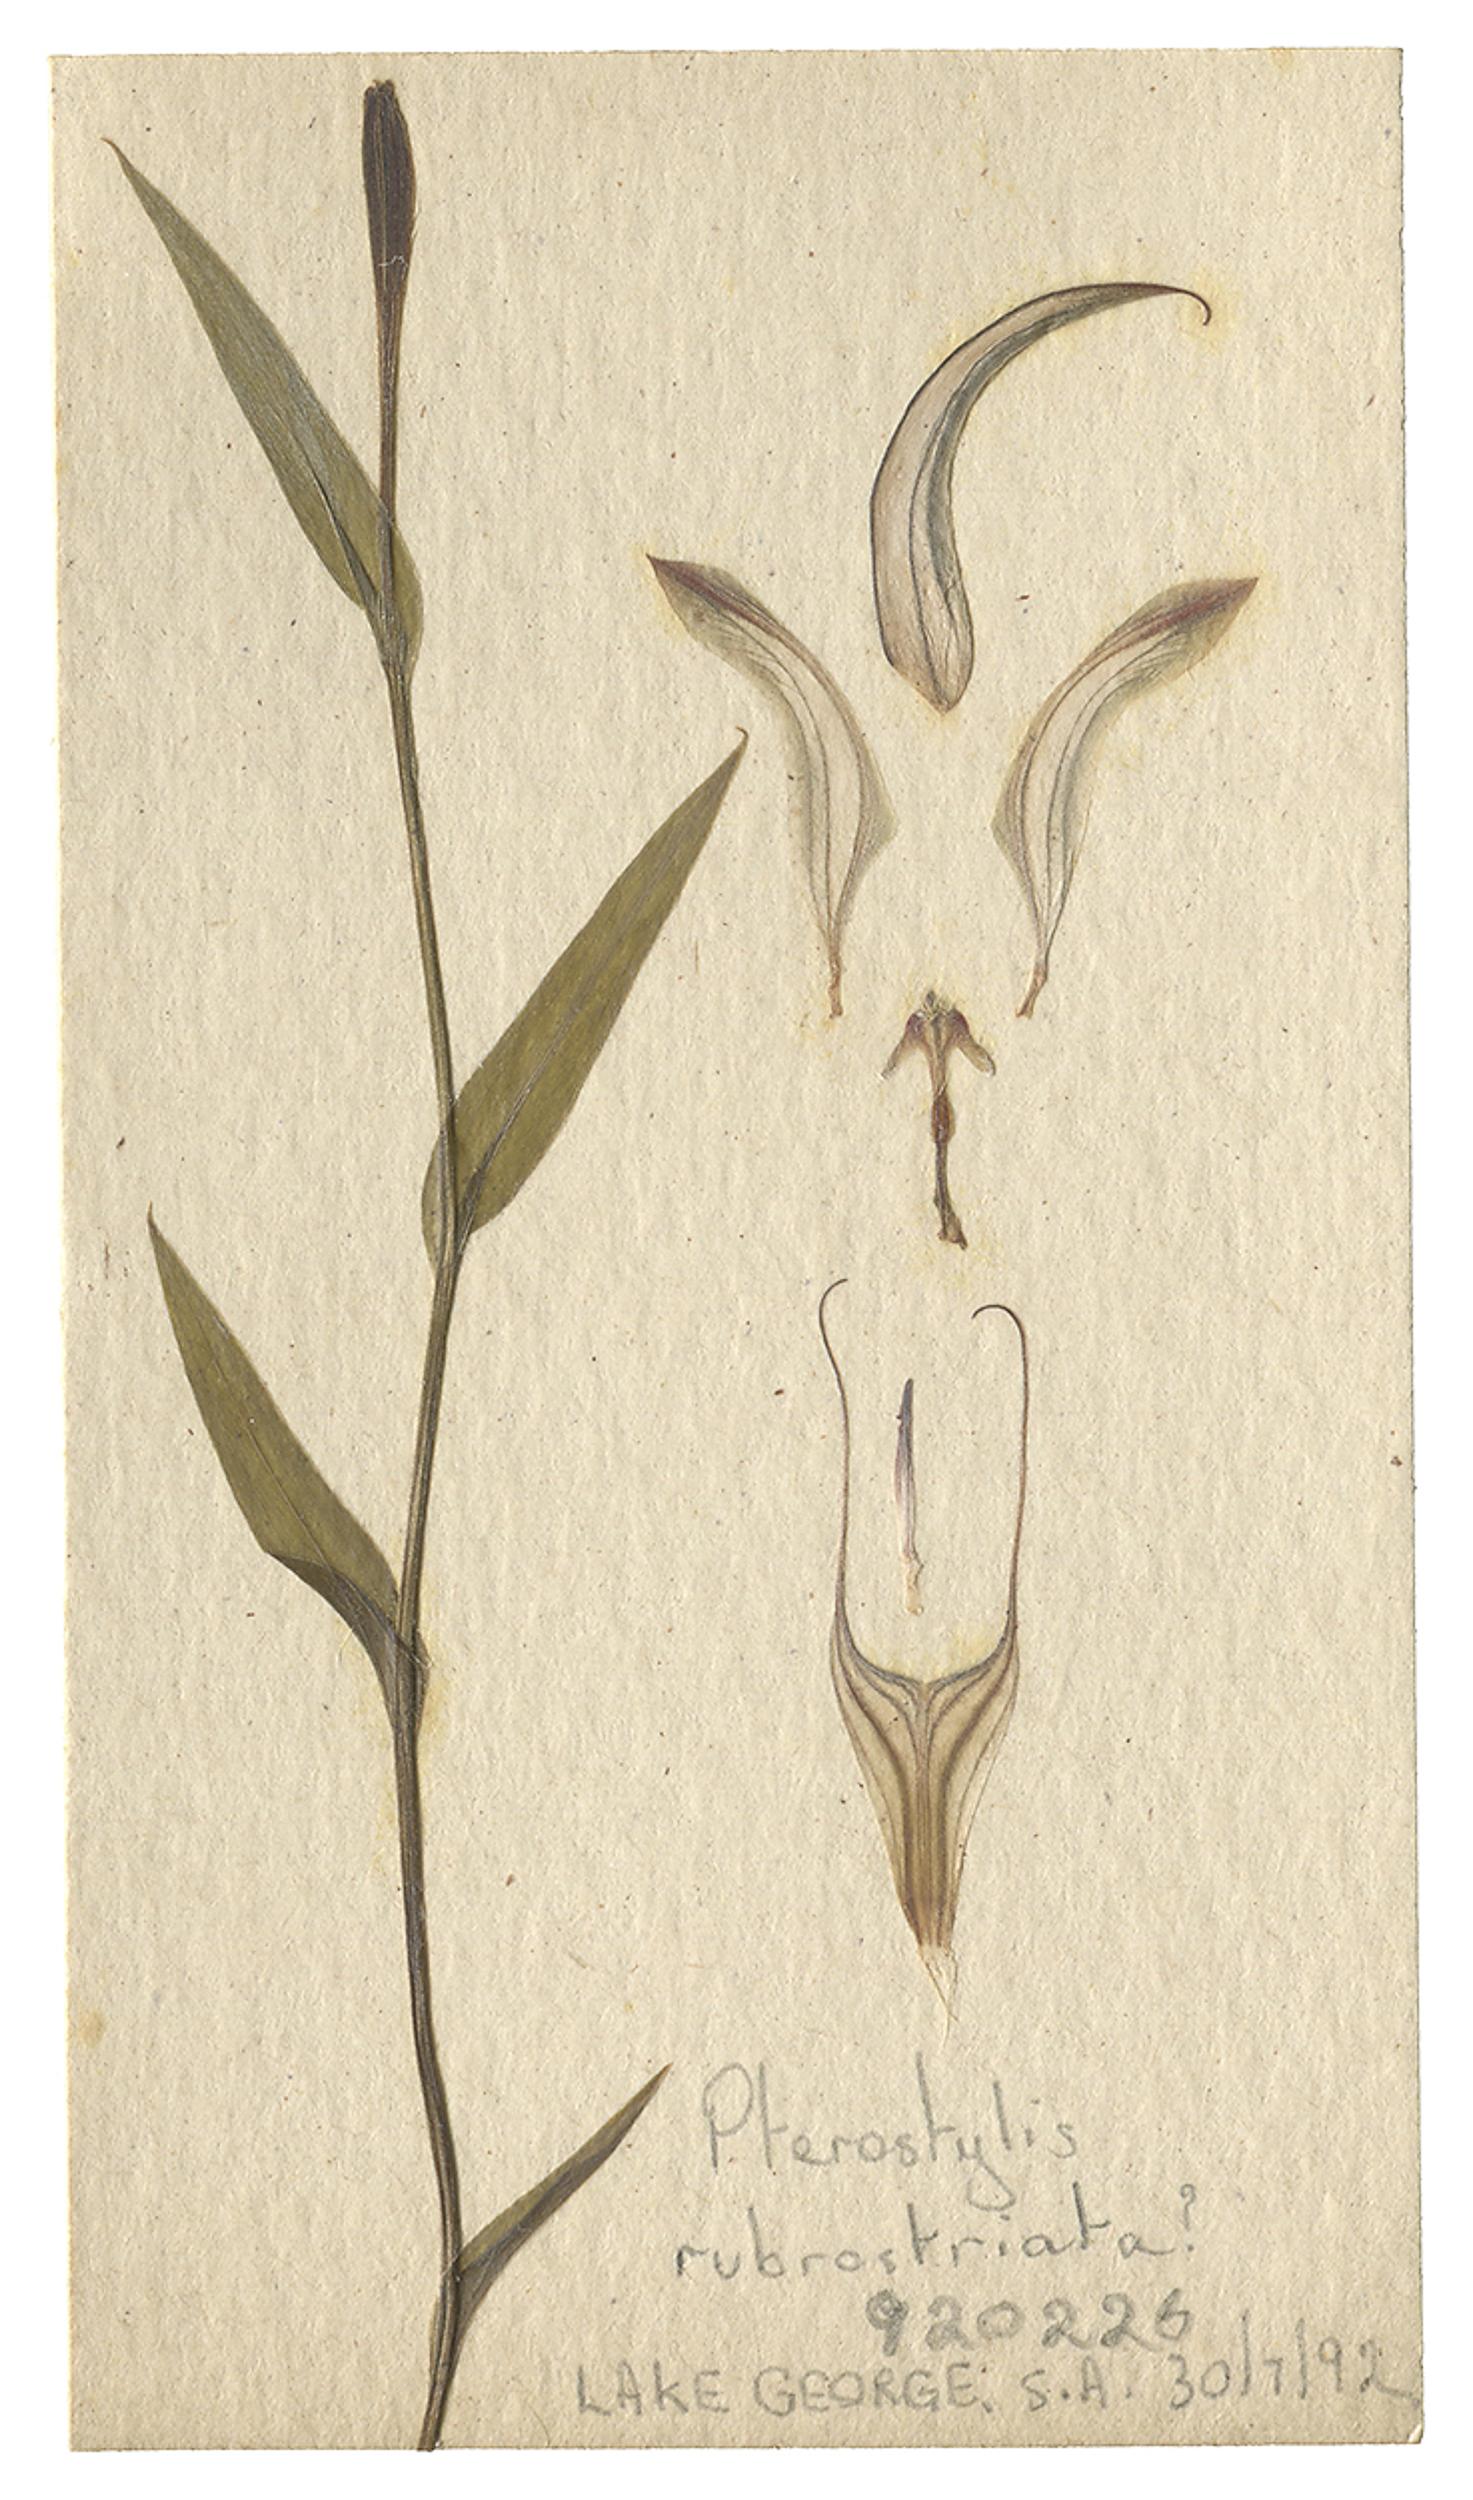 LYON 2017-06-24 Phils Orchid Specimens 262_C.jpg